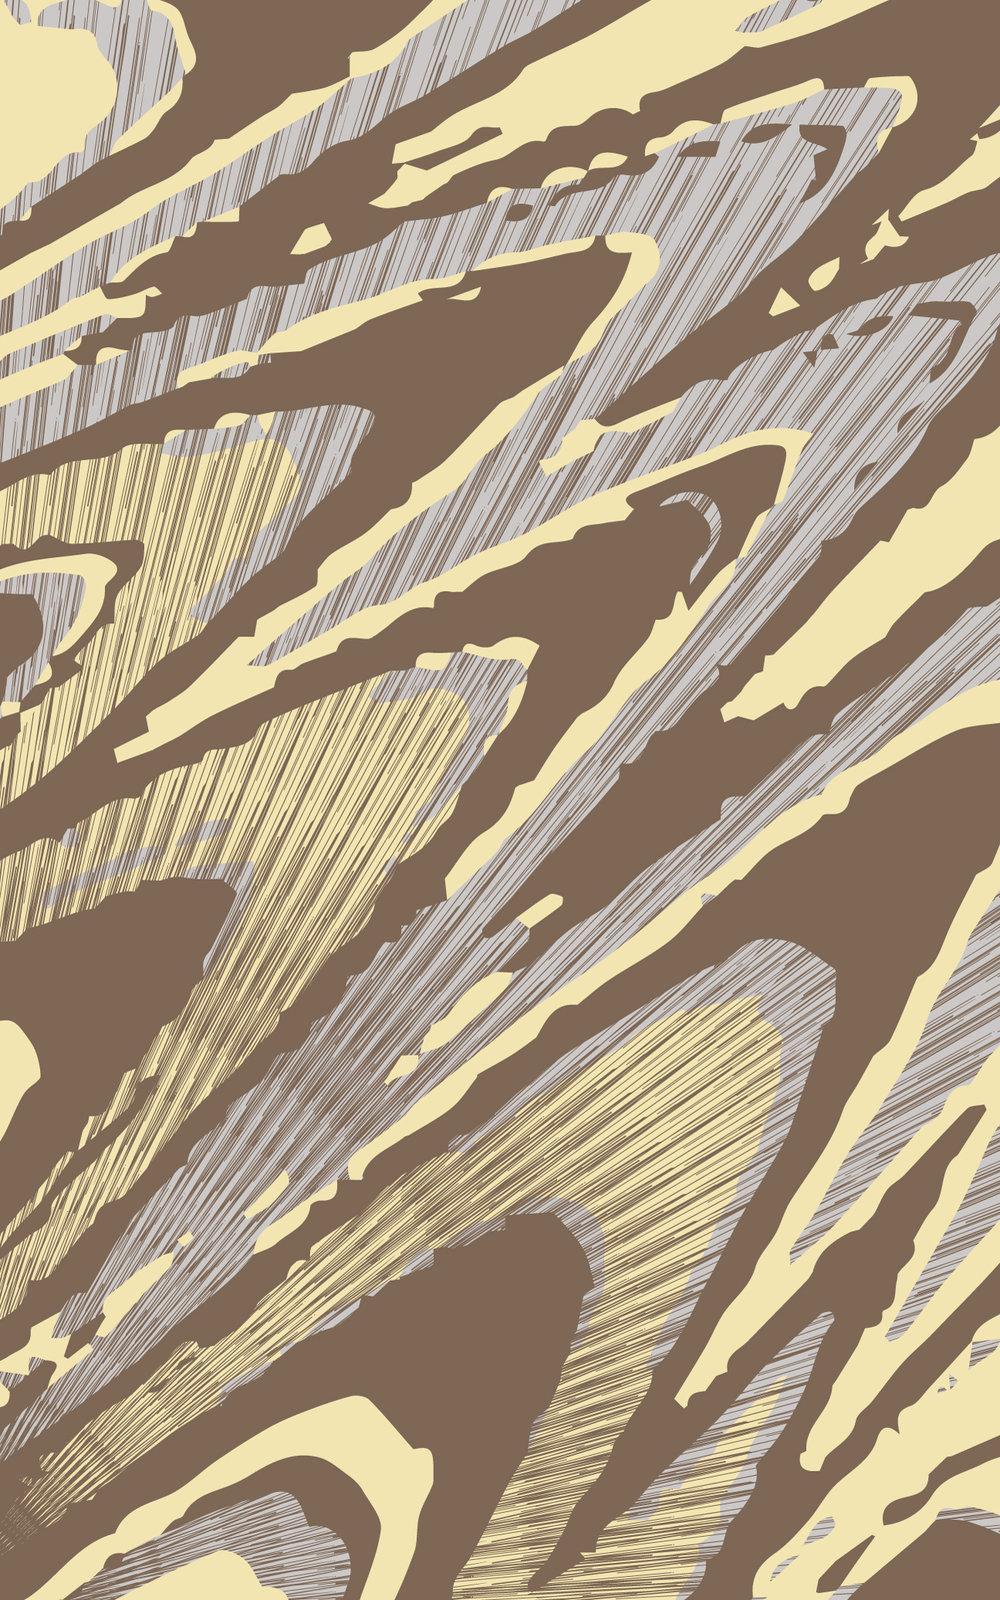 NP010-nicola parente-aer textiles-wave.jpg